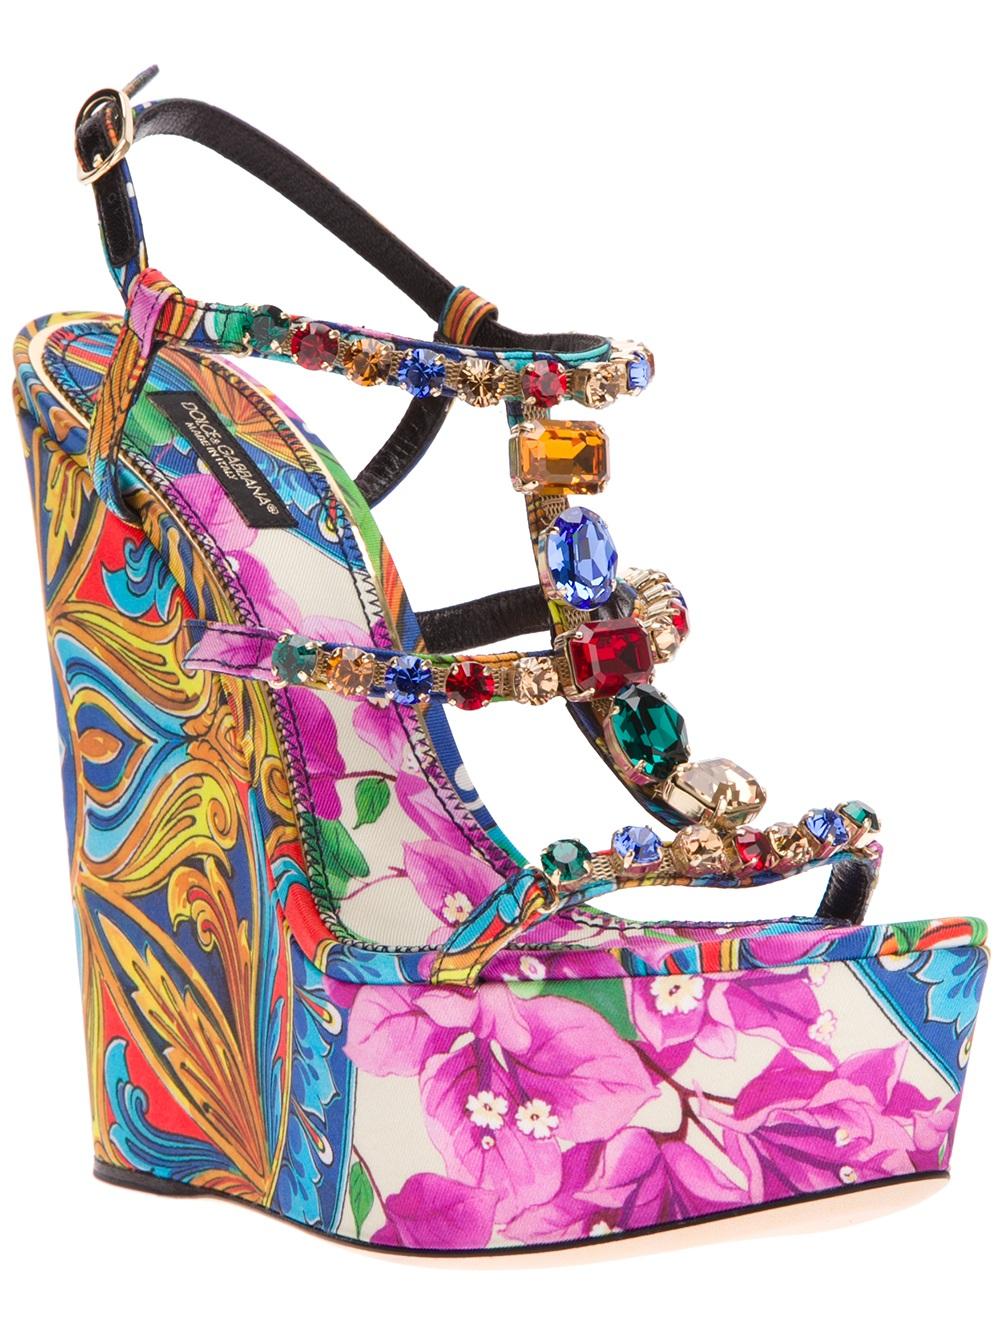 5dcb8ba1760 Lyst - Dolce   Gabbana Printed Wedge Sandal